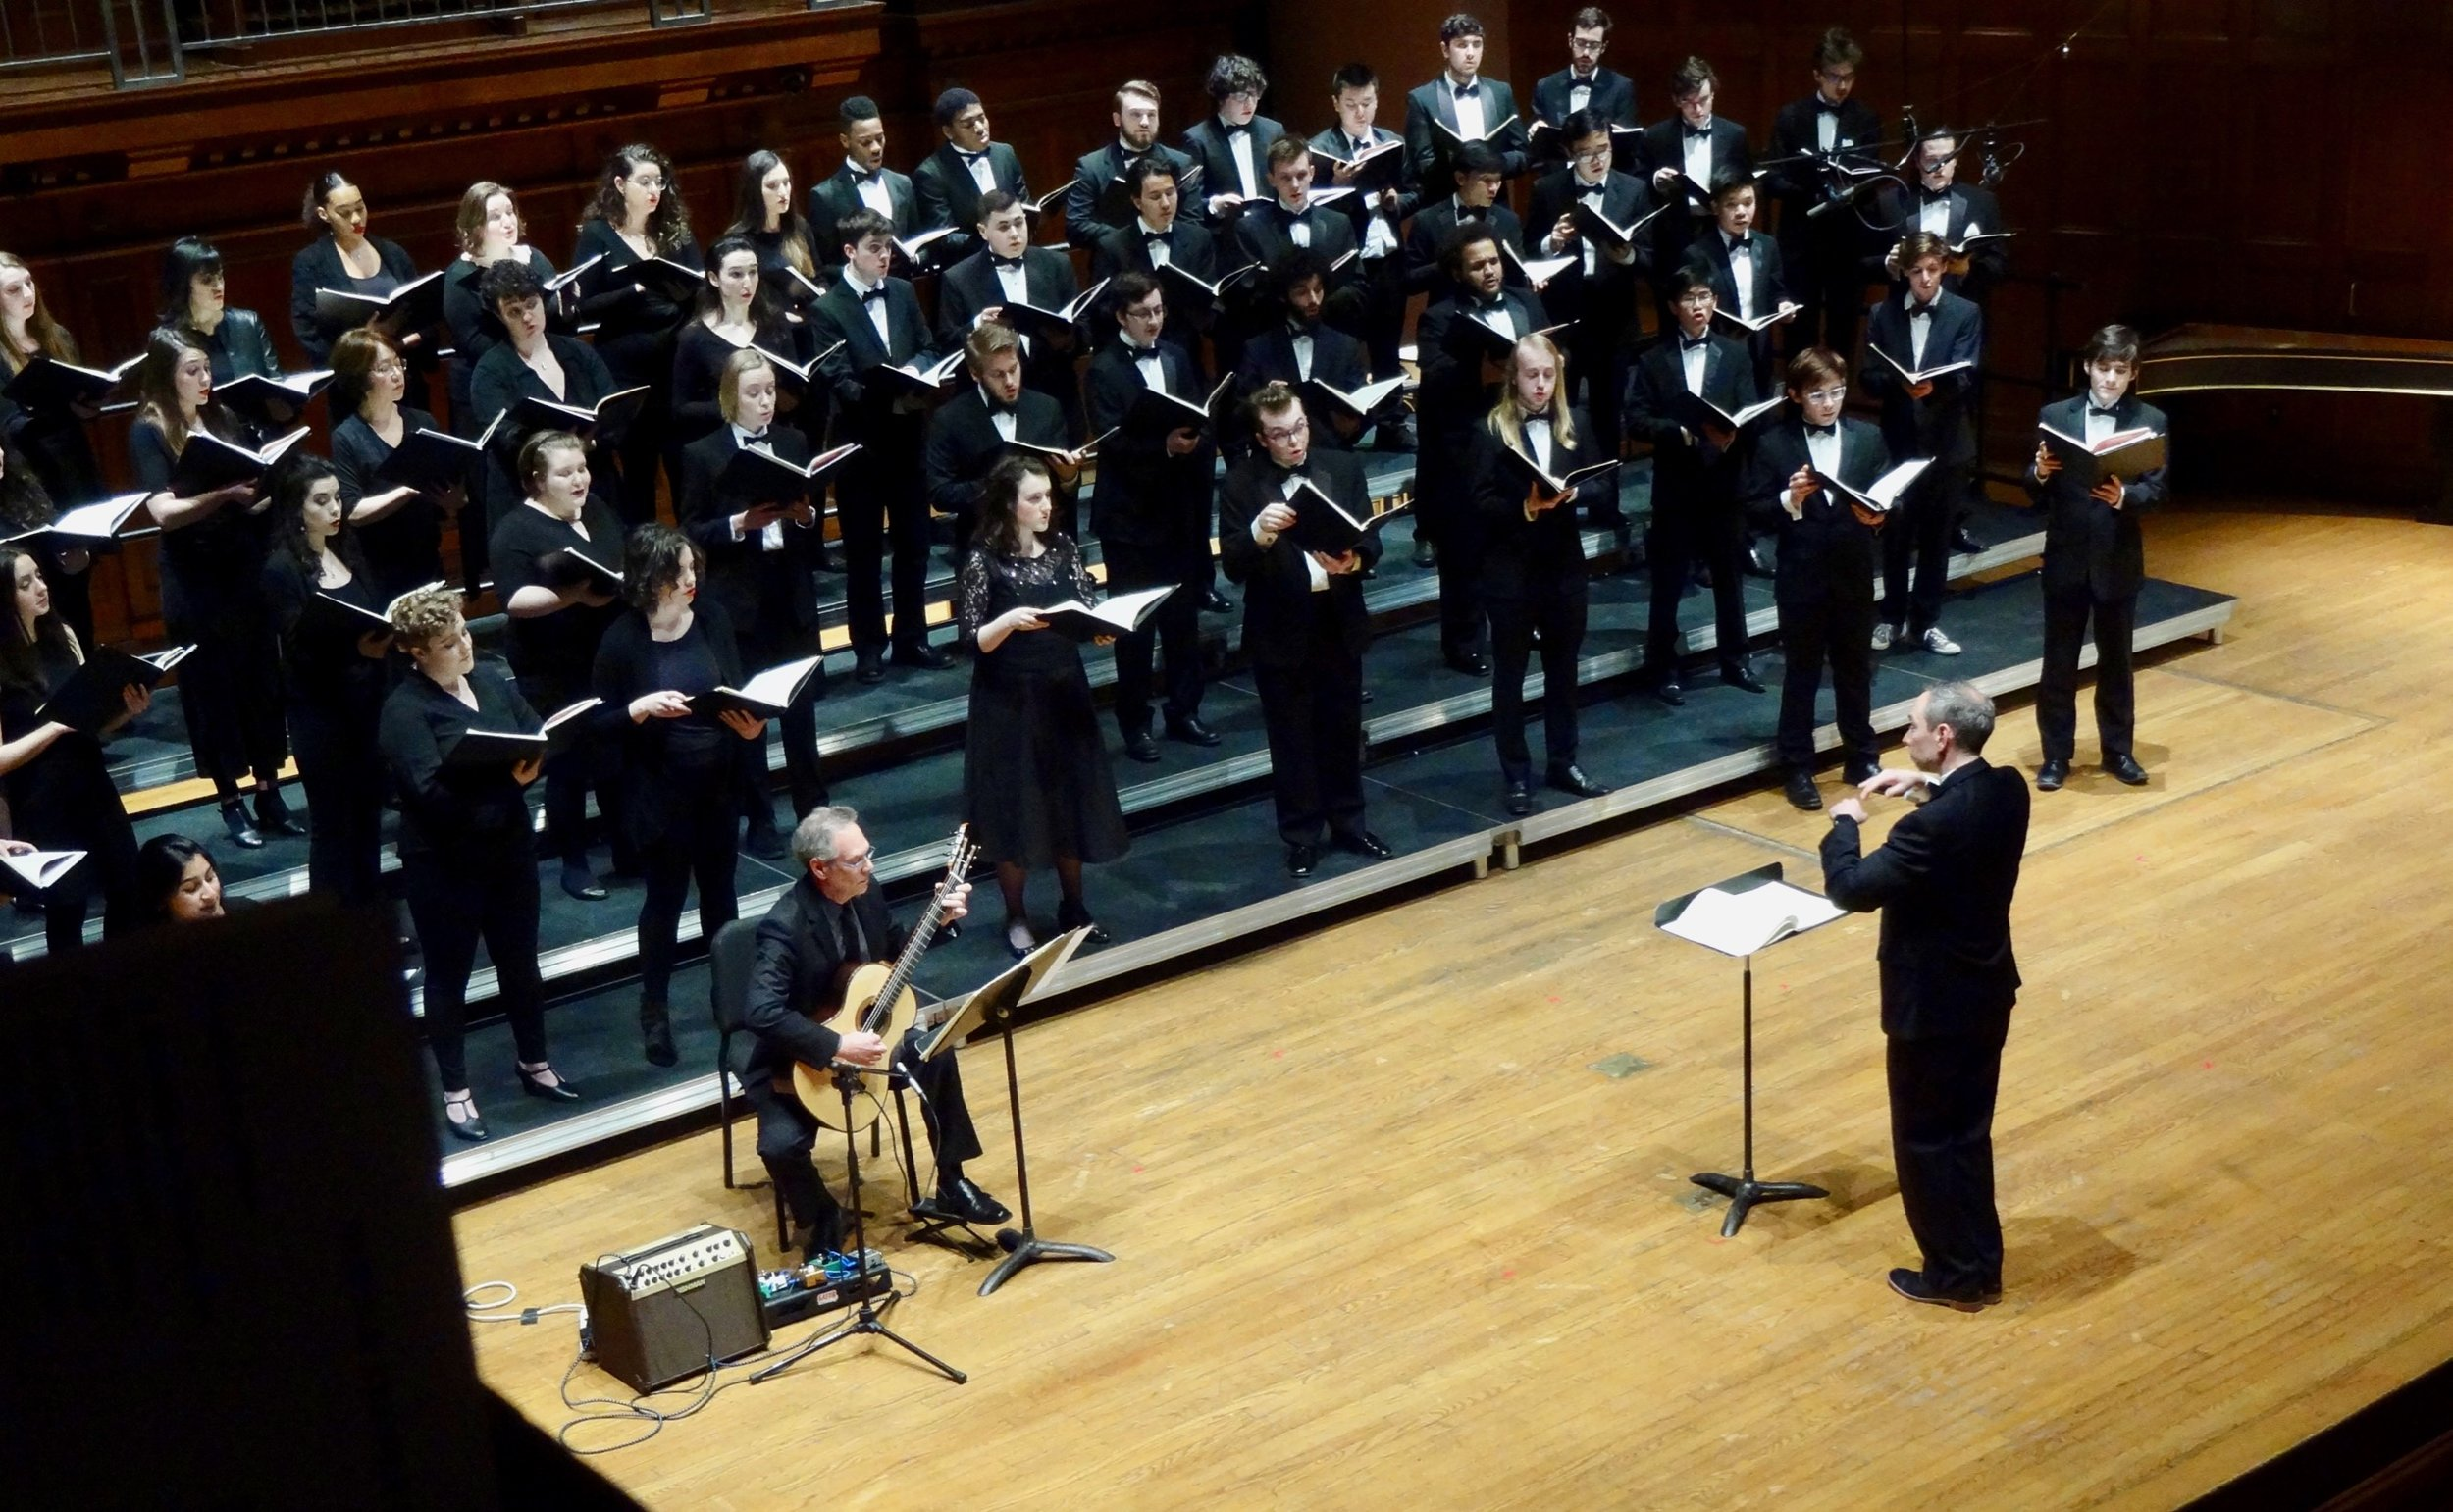 Stephen Aron with Oberlin Concert Choir and Greg Ristow conducting, perform Castelnuovo-Tedesco's  Romancero Gitano